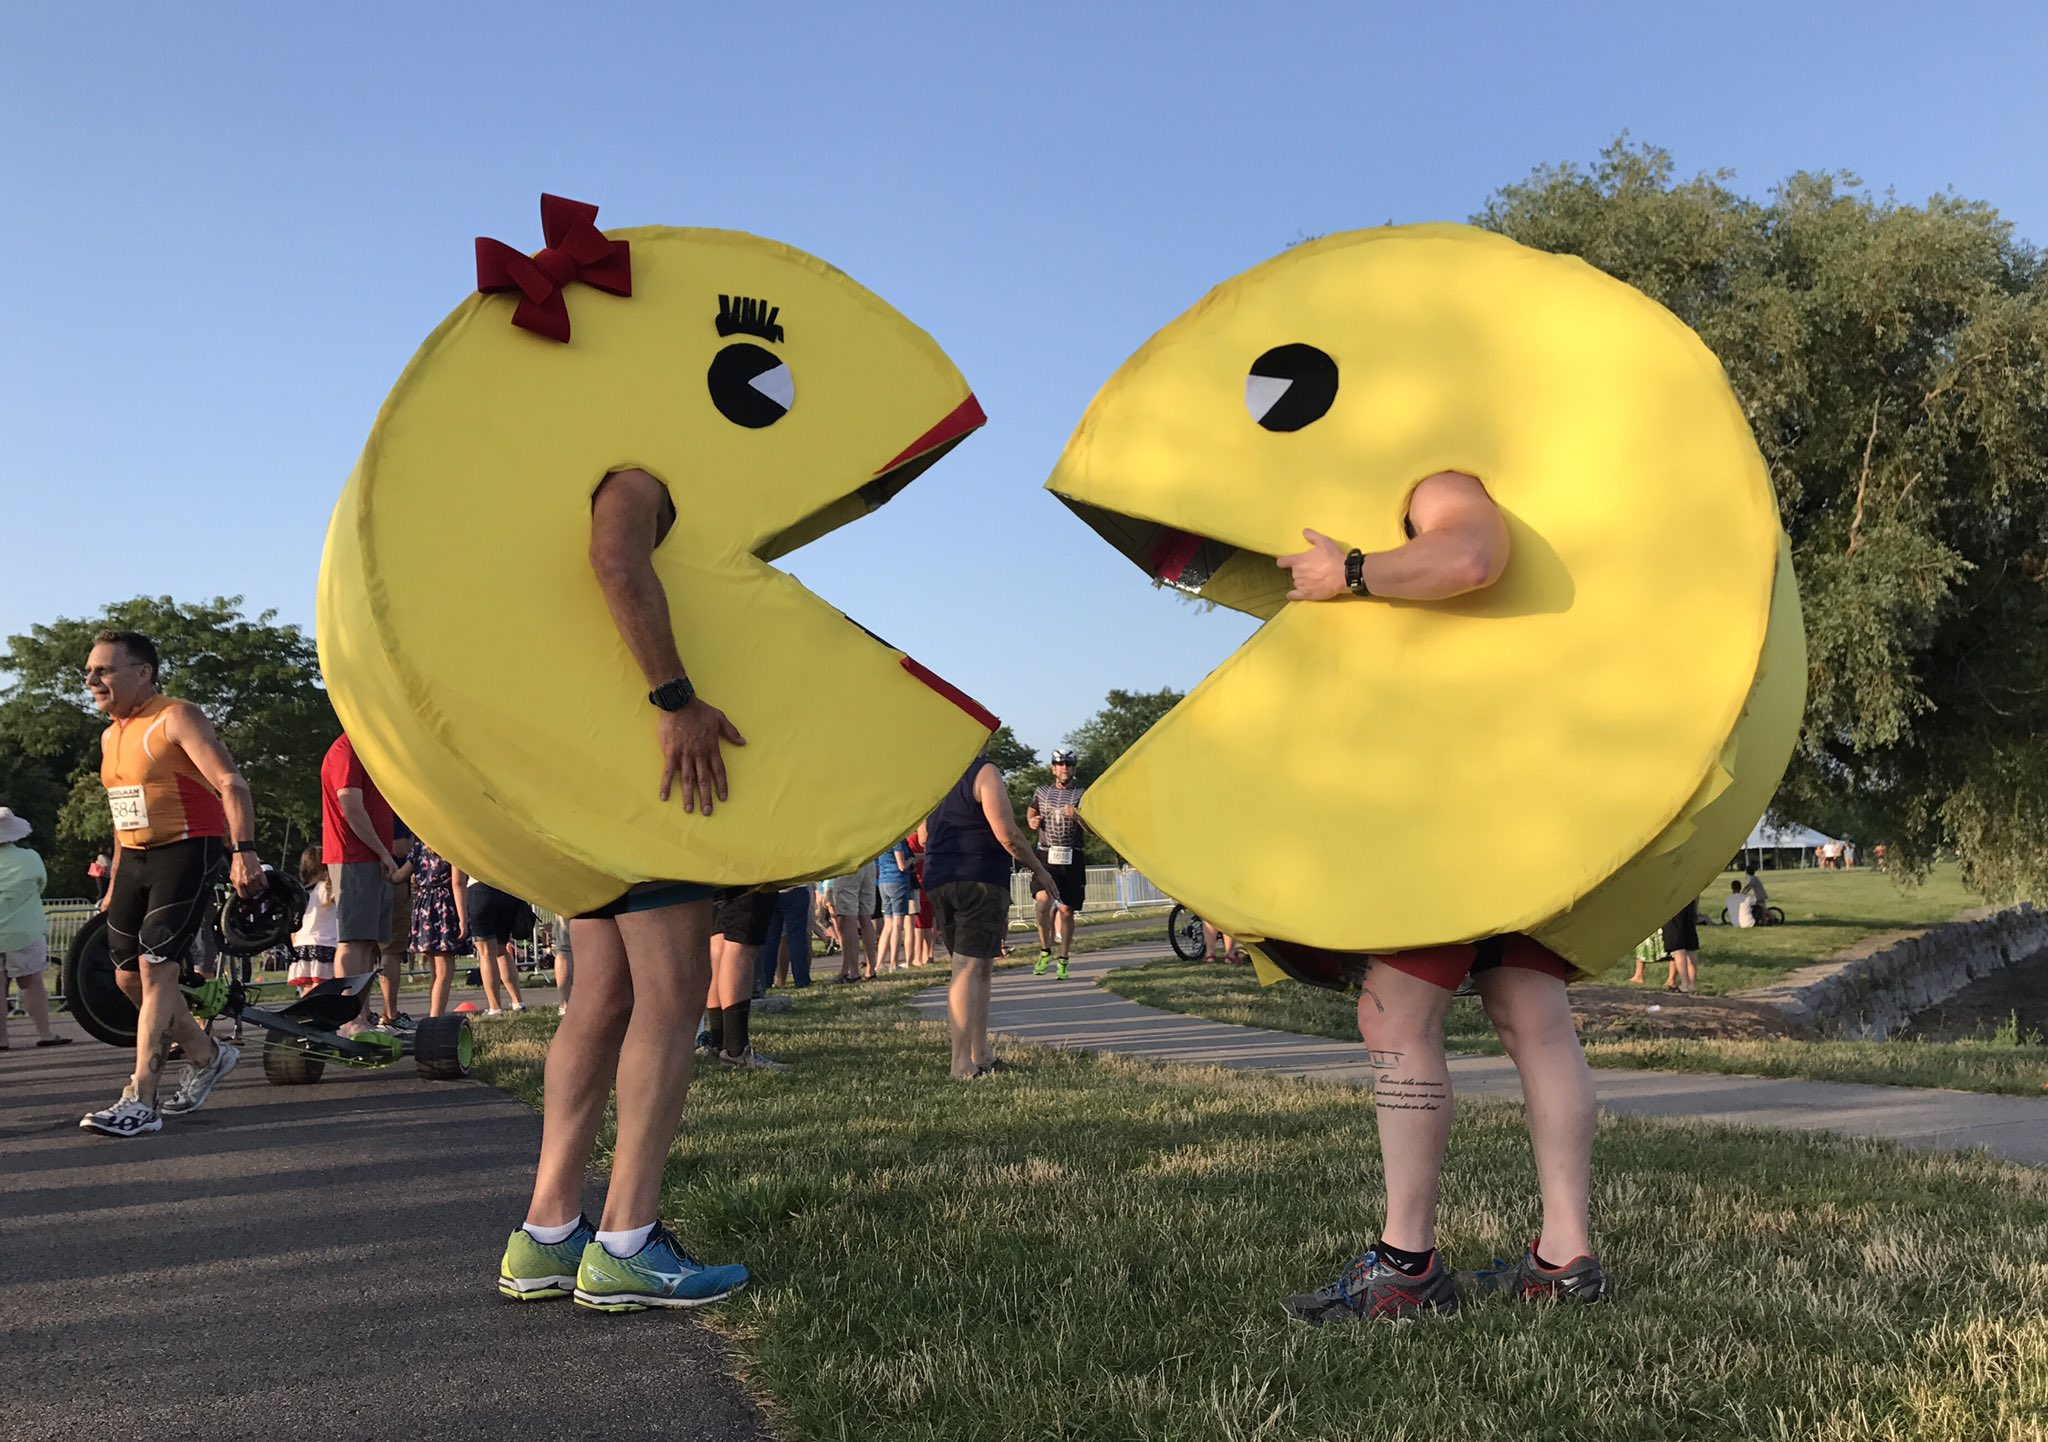 Mrs. & Mr. Pac-Man sighting at one of my favorite multisport events! #Musselman2017 https://t.co/mruZxAUUl0